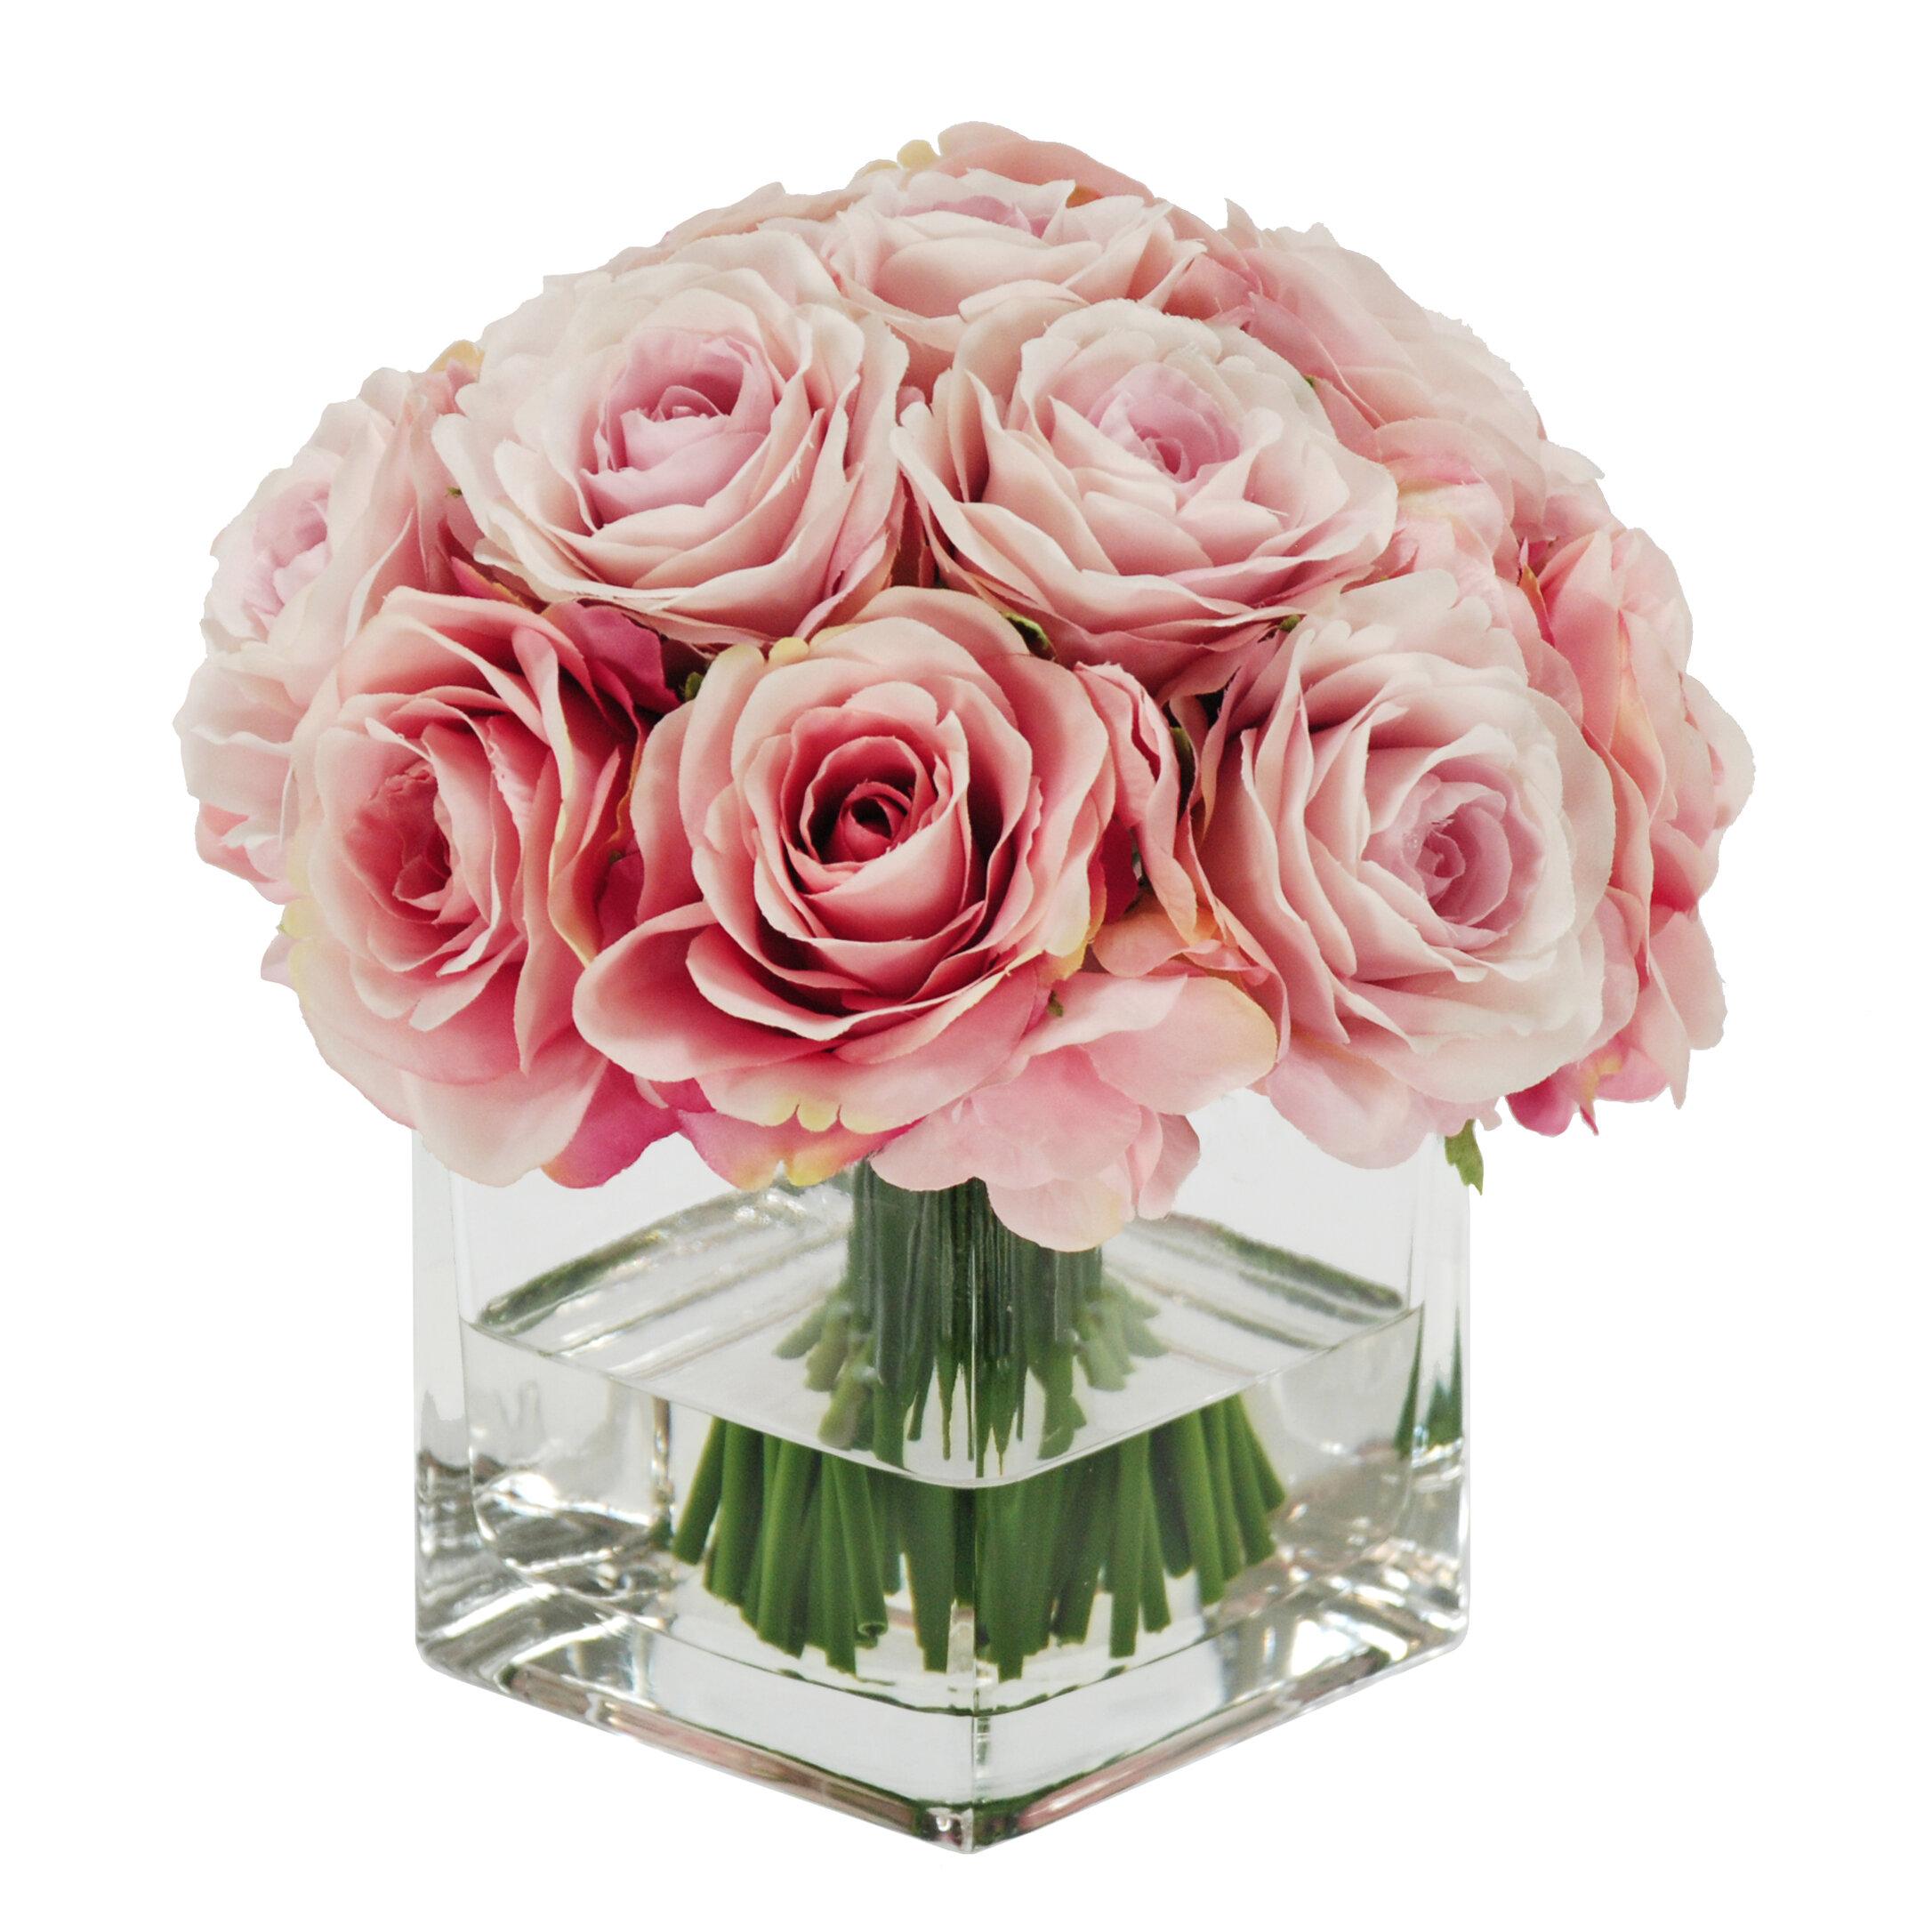 Winward Silks Rose Bouquet In Square Vase Floral Arrangements